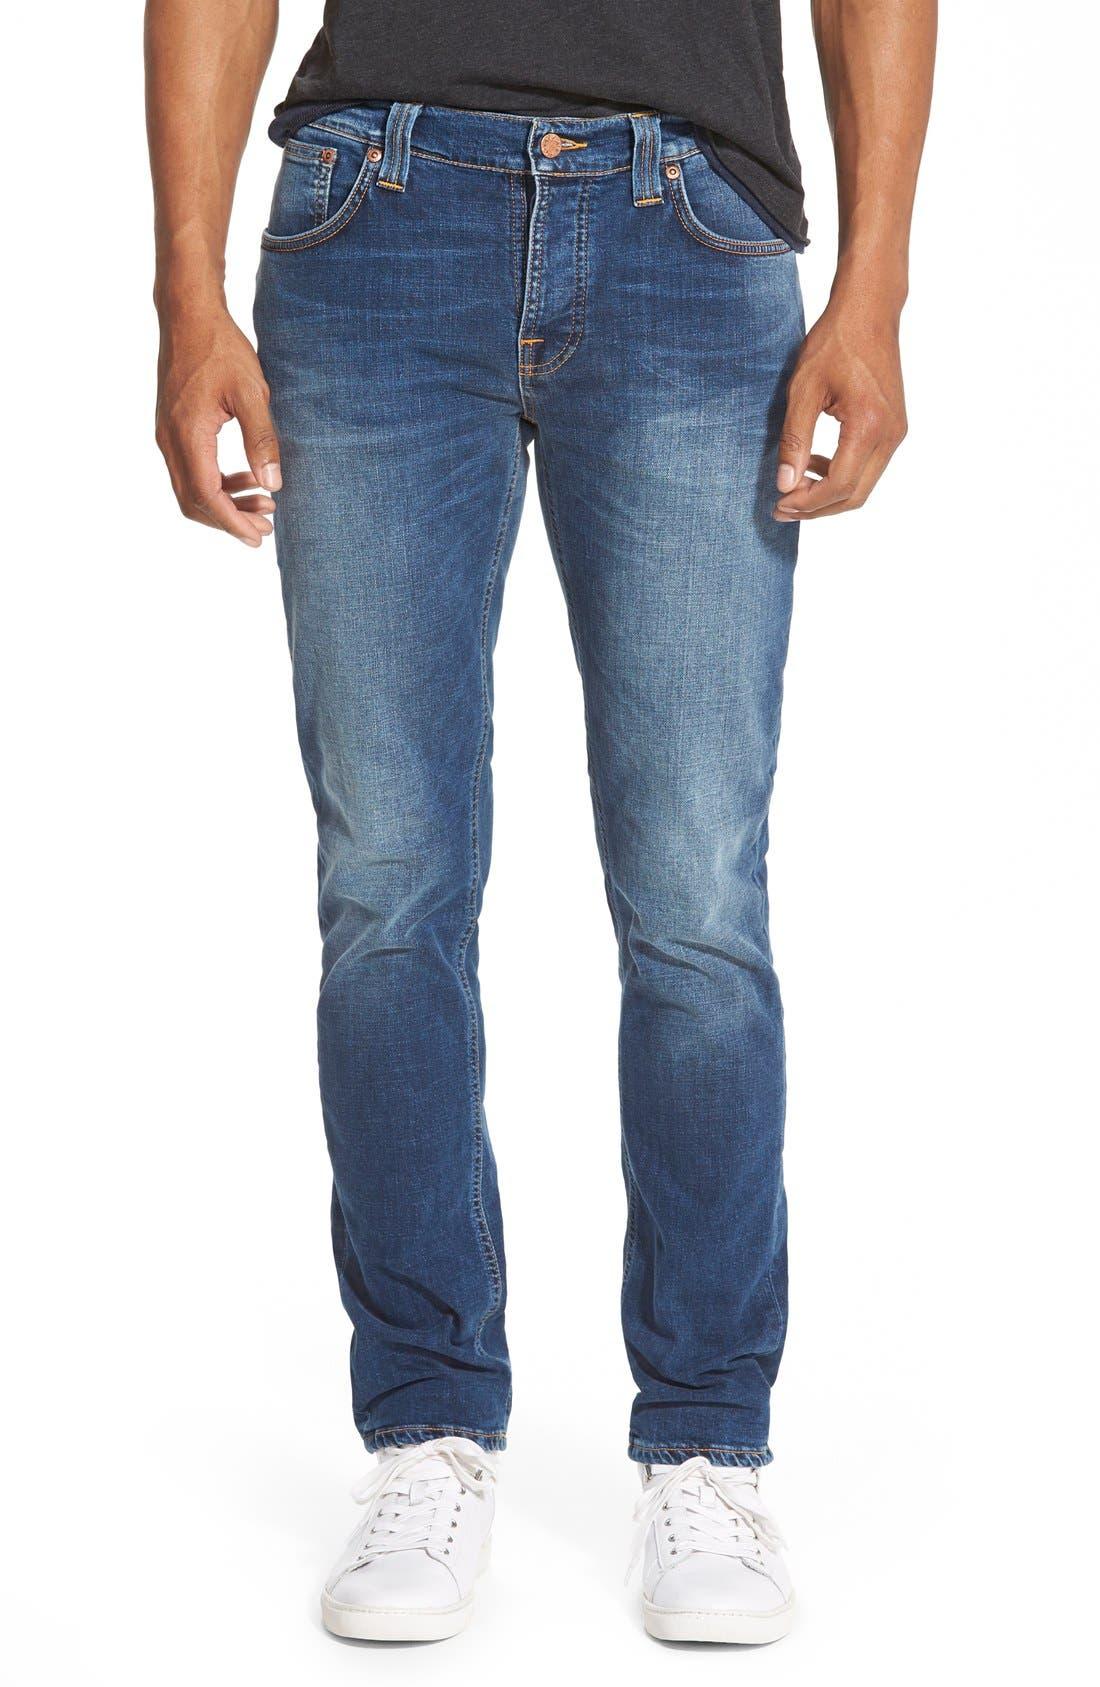 NUDIE JEANS,                             'Grim Tim' Slim Fit Stretch Organic Cotton Jeans,                             Main thumbnail 1, color,                             462